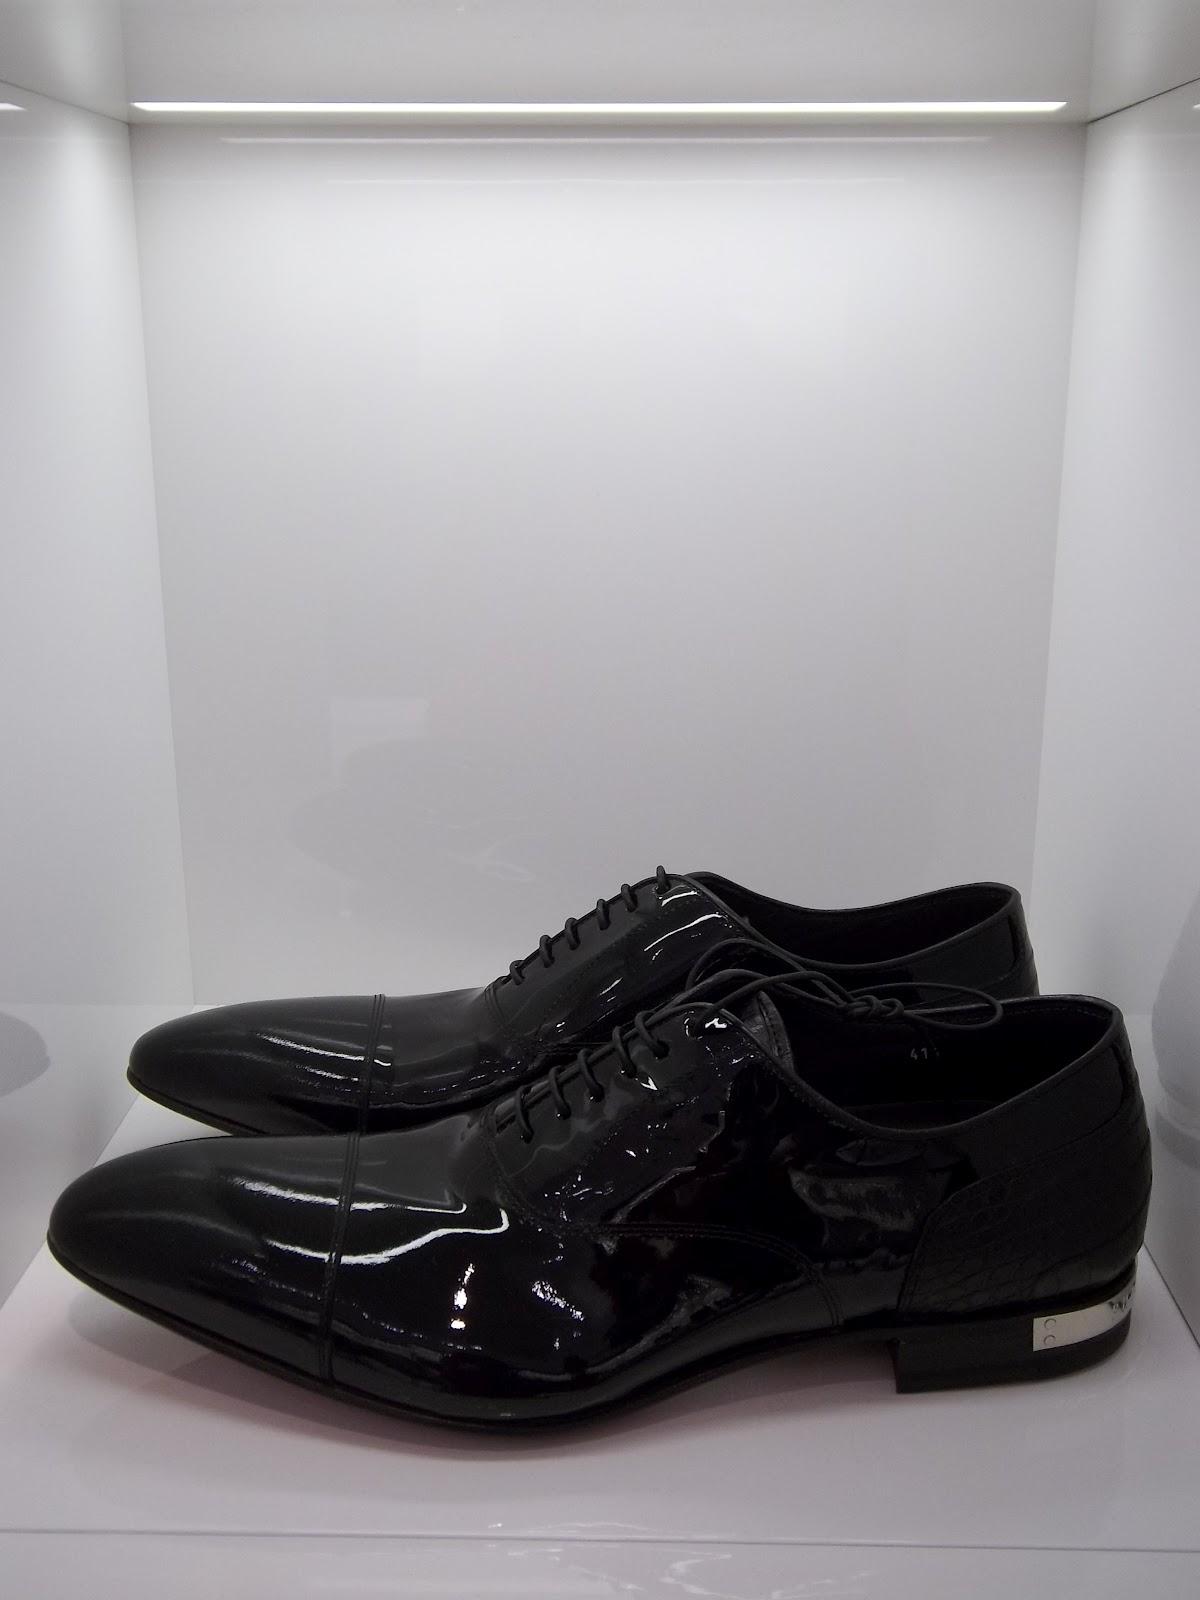 Philipp Plein Shoes Size